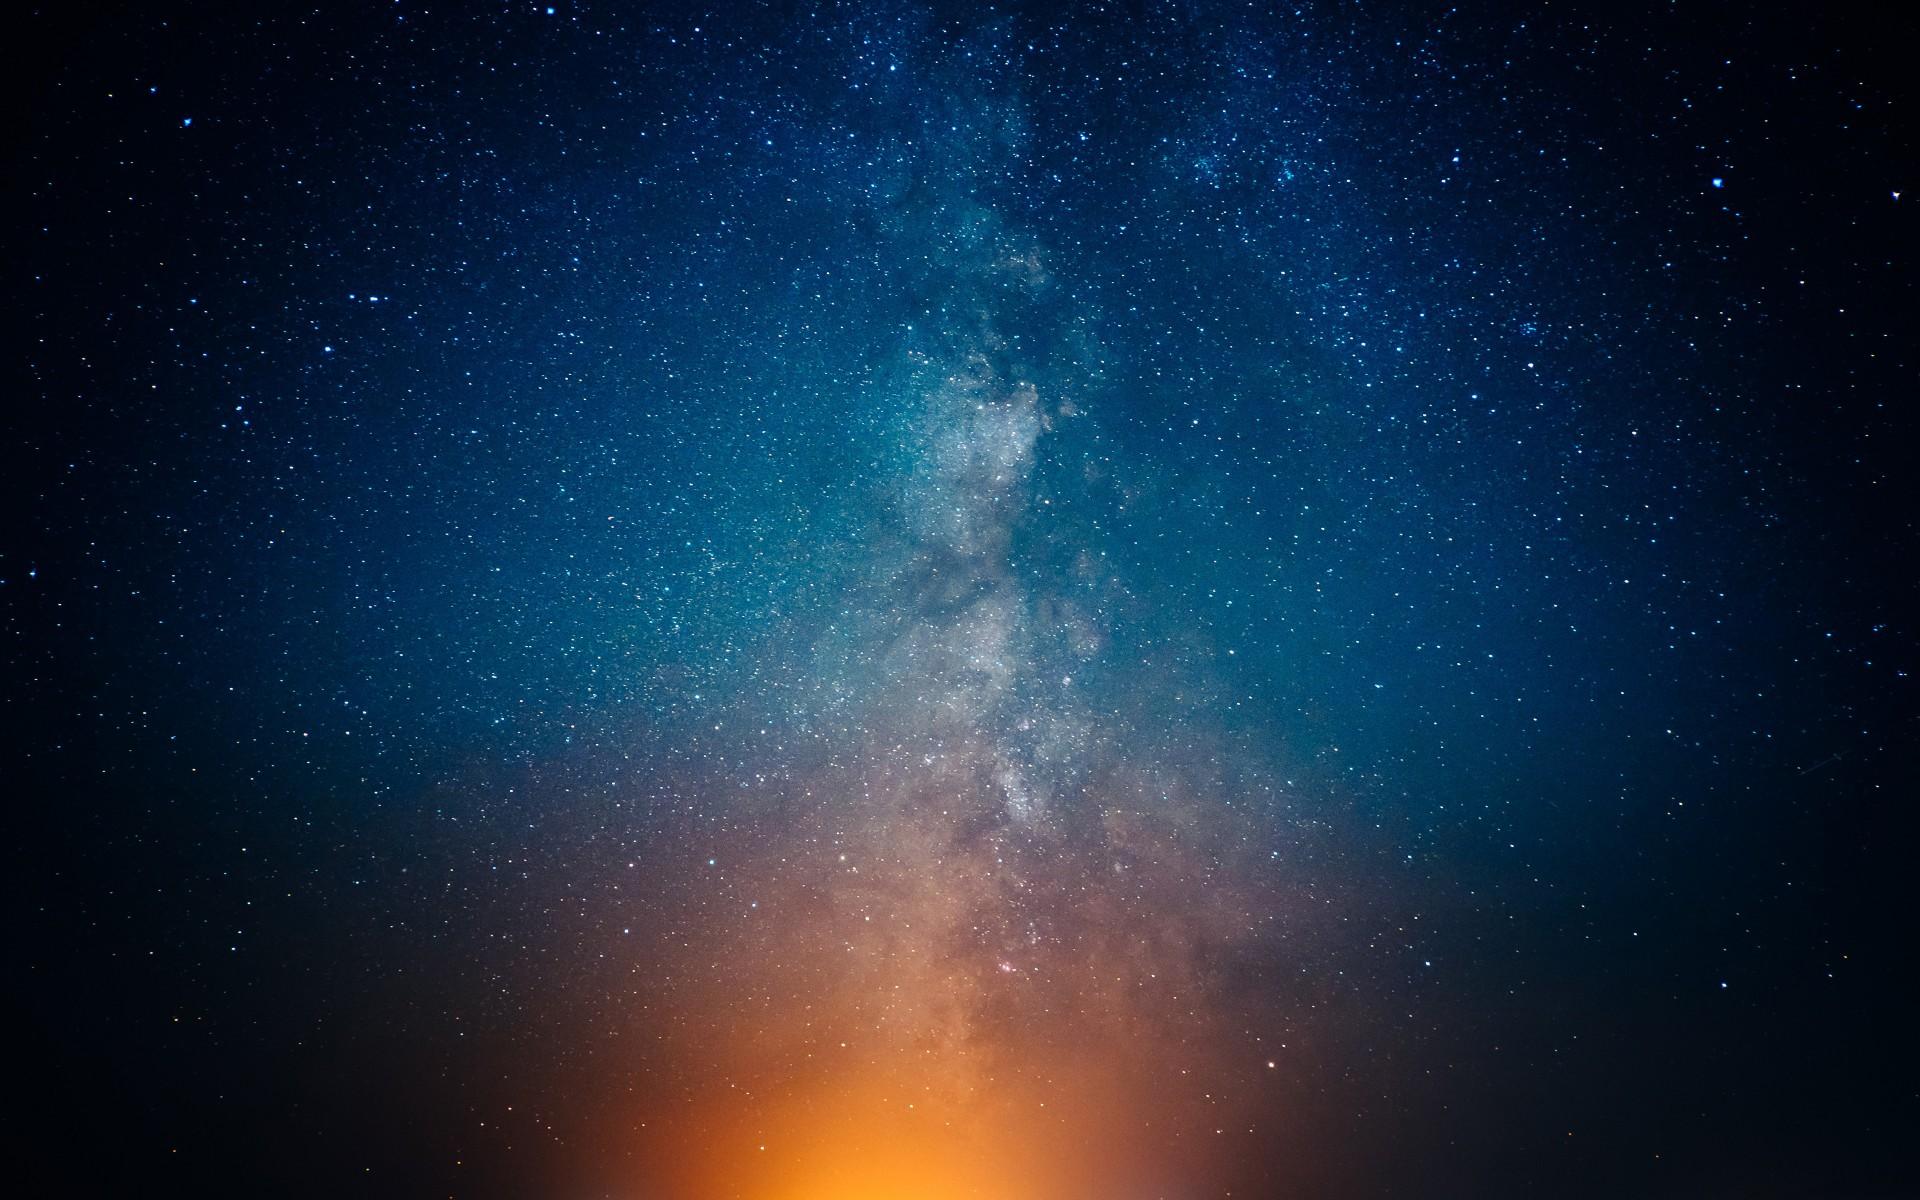 Iphone Wallpaper Trippy Starry Milky Way Sky 4k Wallpapers Hd Wallpapers Id 24530